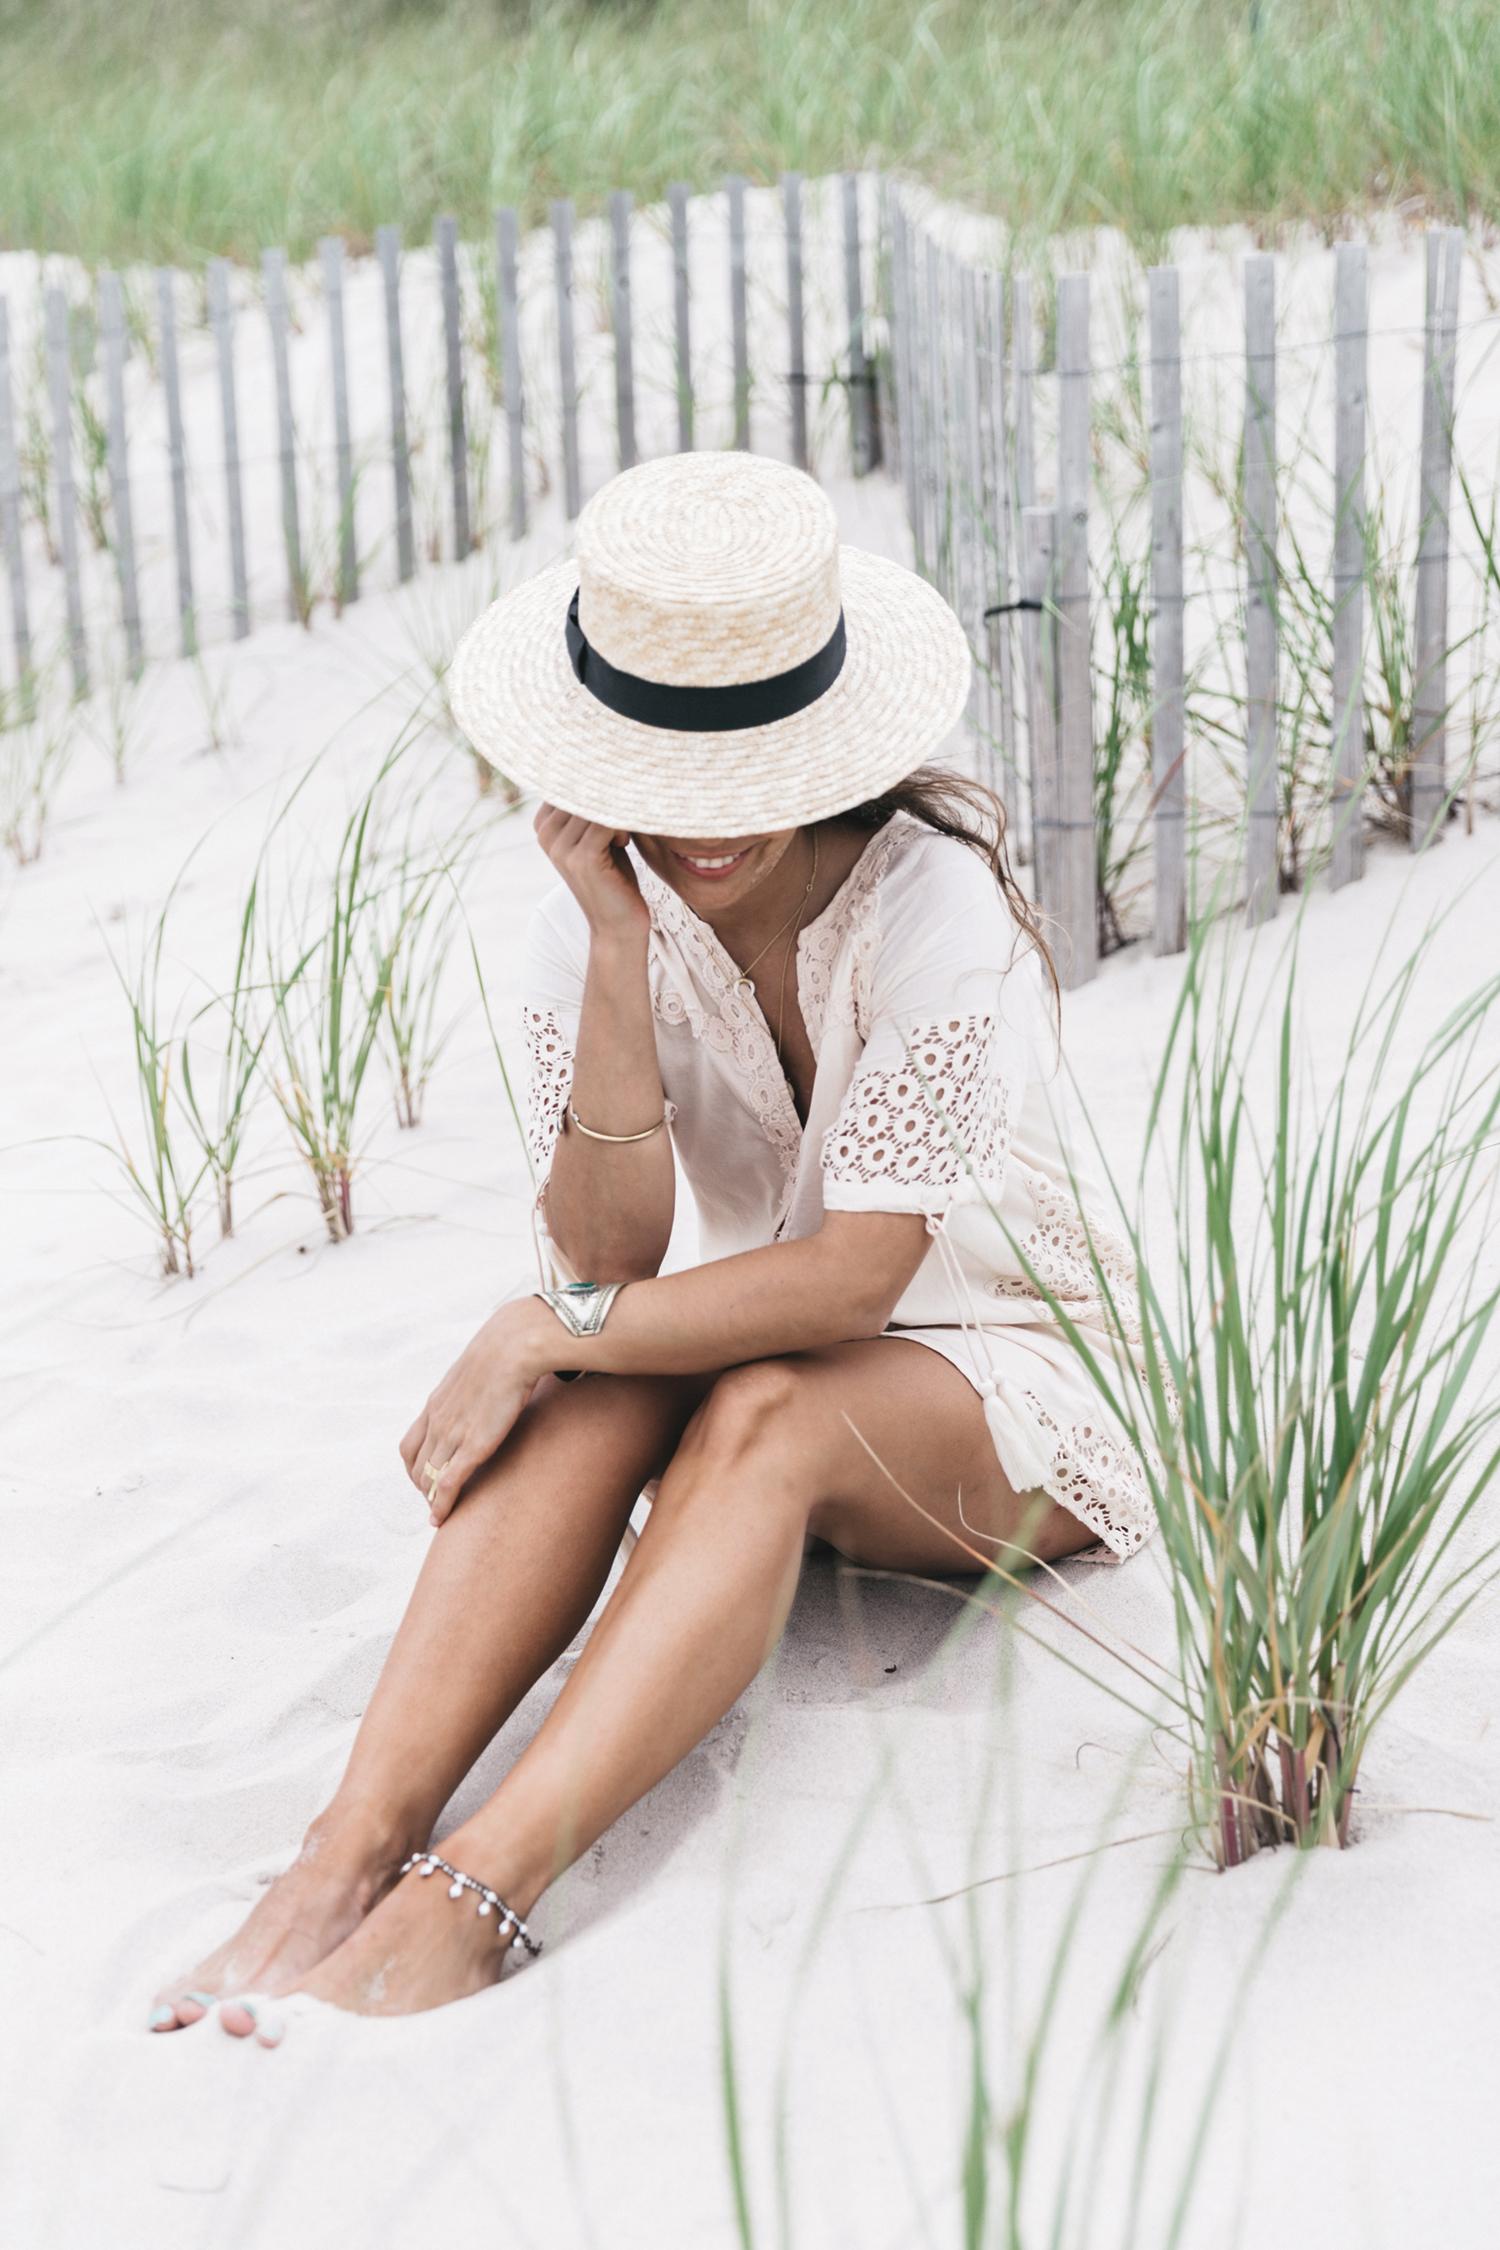 Revolve_in_The_Hamptons-Revolve_Clothing-Collage_Vintage-Cream_Dress-Tularosa-Canotier-41